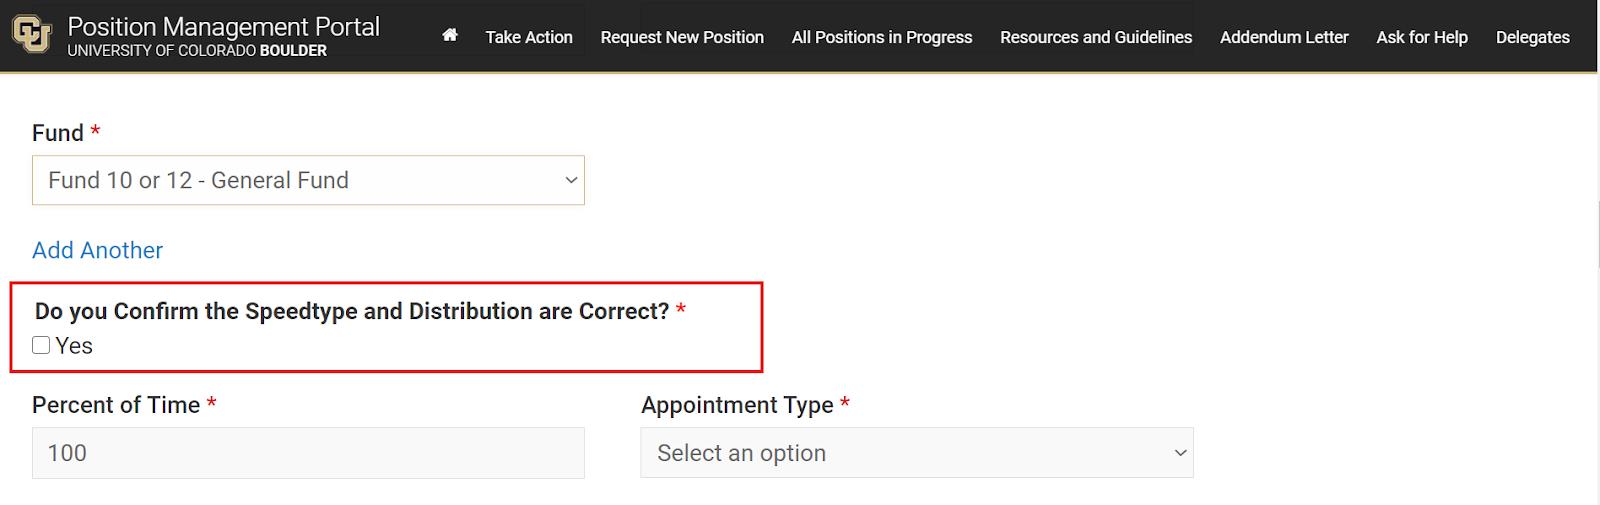 Screen shot of position management portal. contact recruiting@colorado.edu